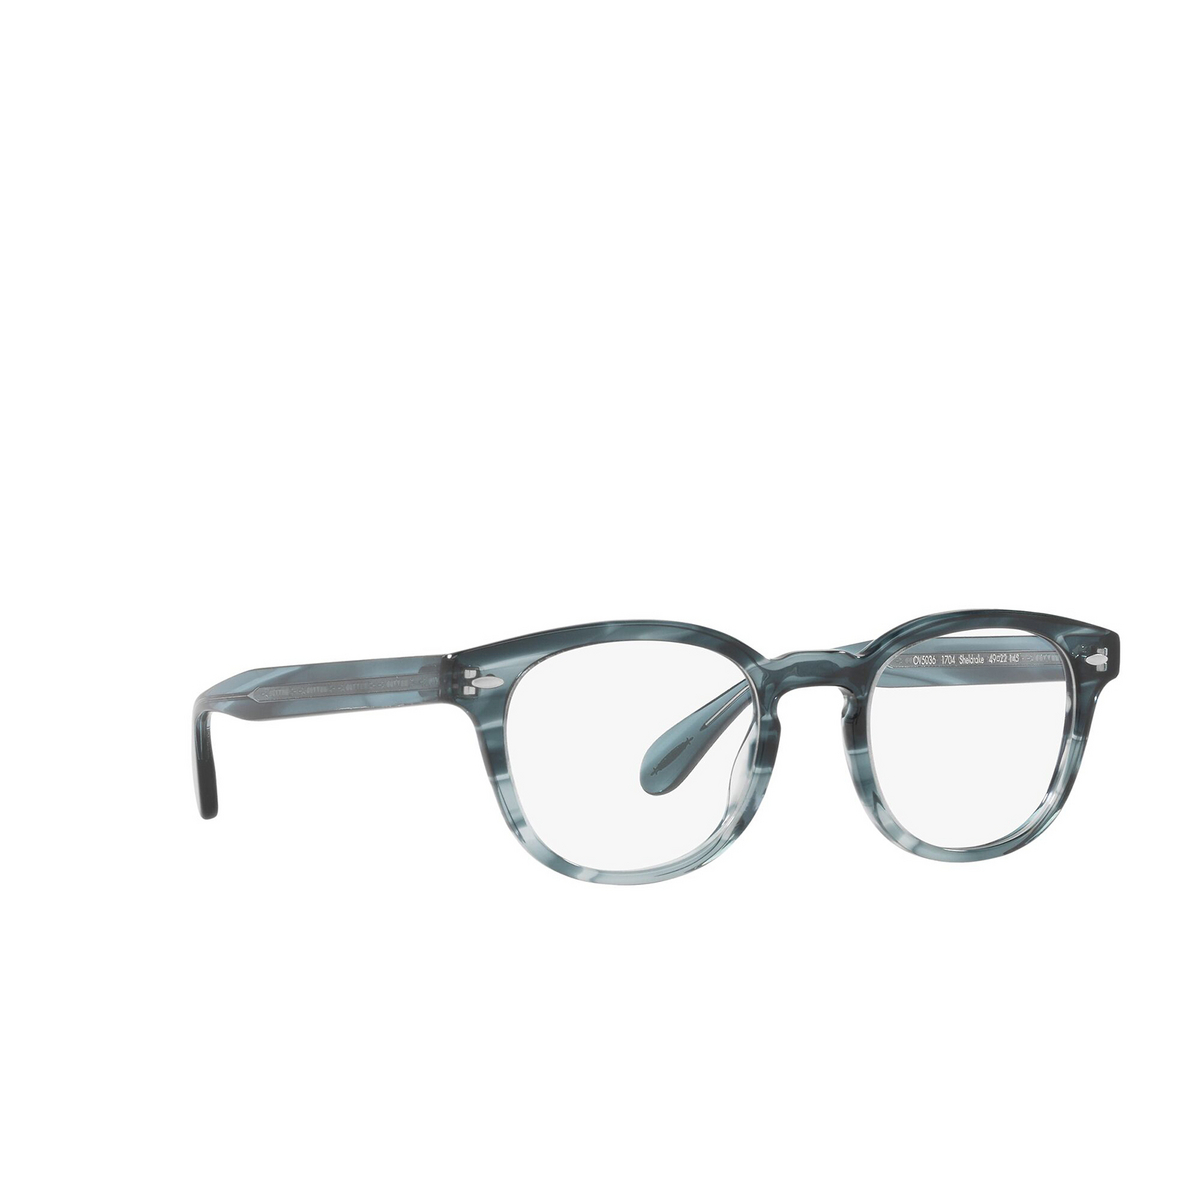 Oliver Peoples® Square Eyeglasses: Sheldrake OV5036 color Washed Lapis 1704 - three-quarters view.